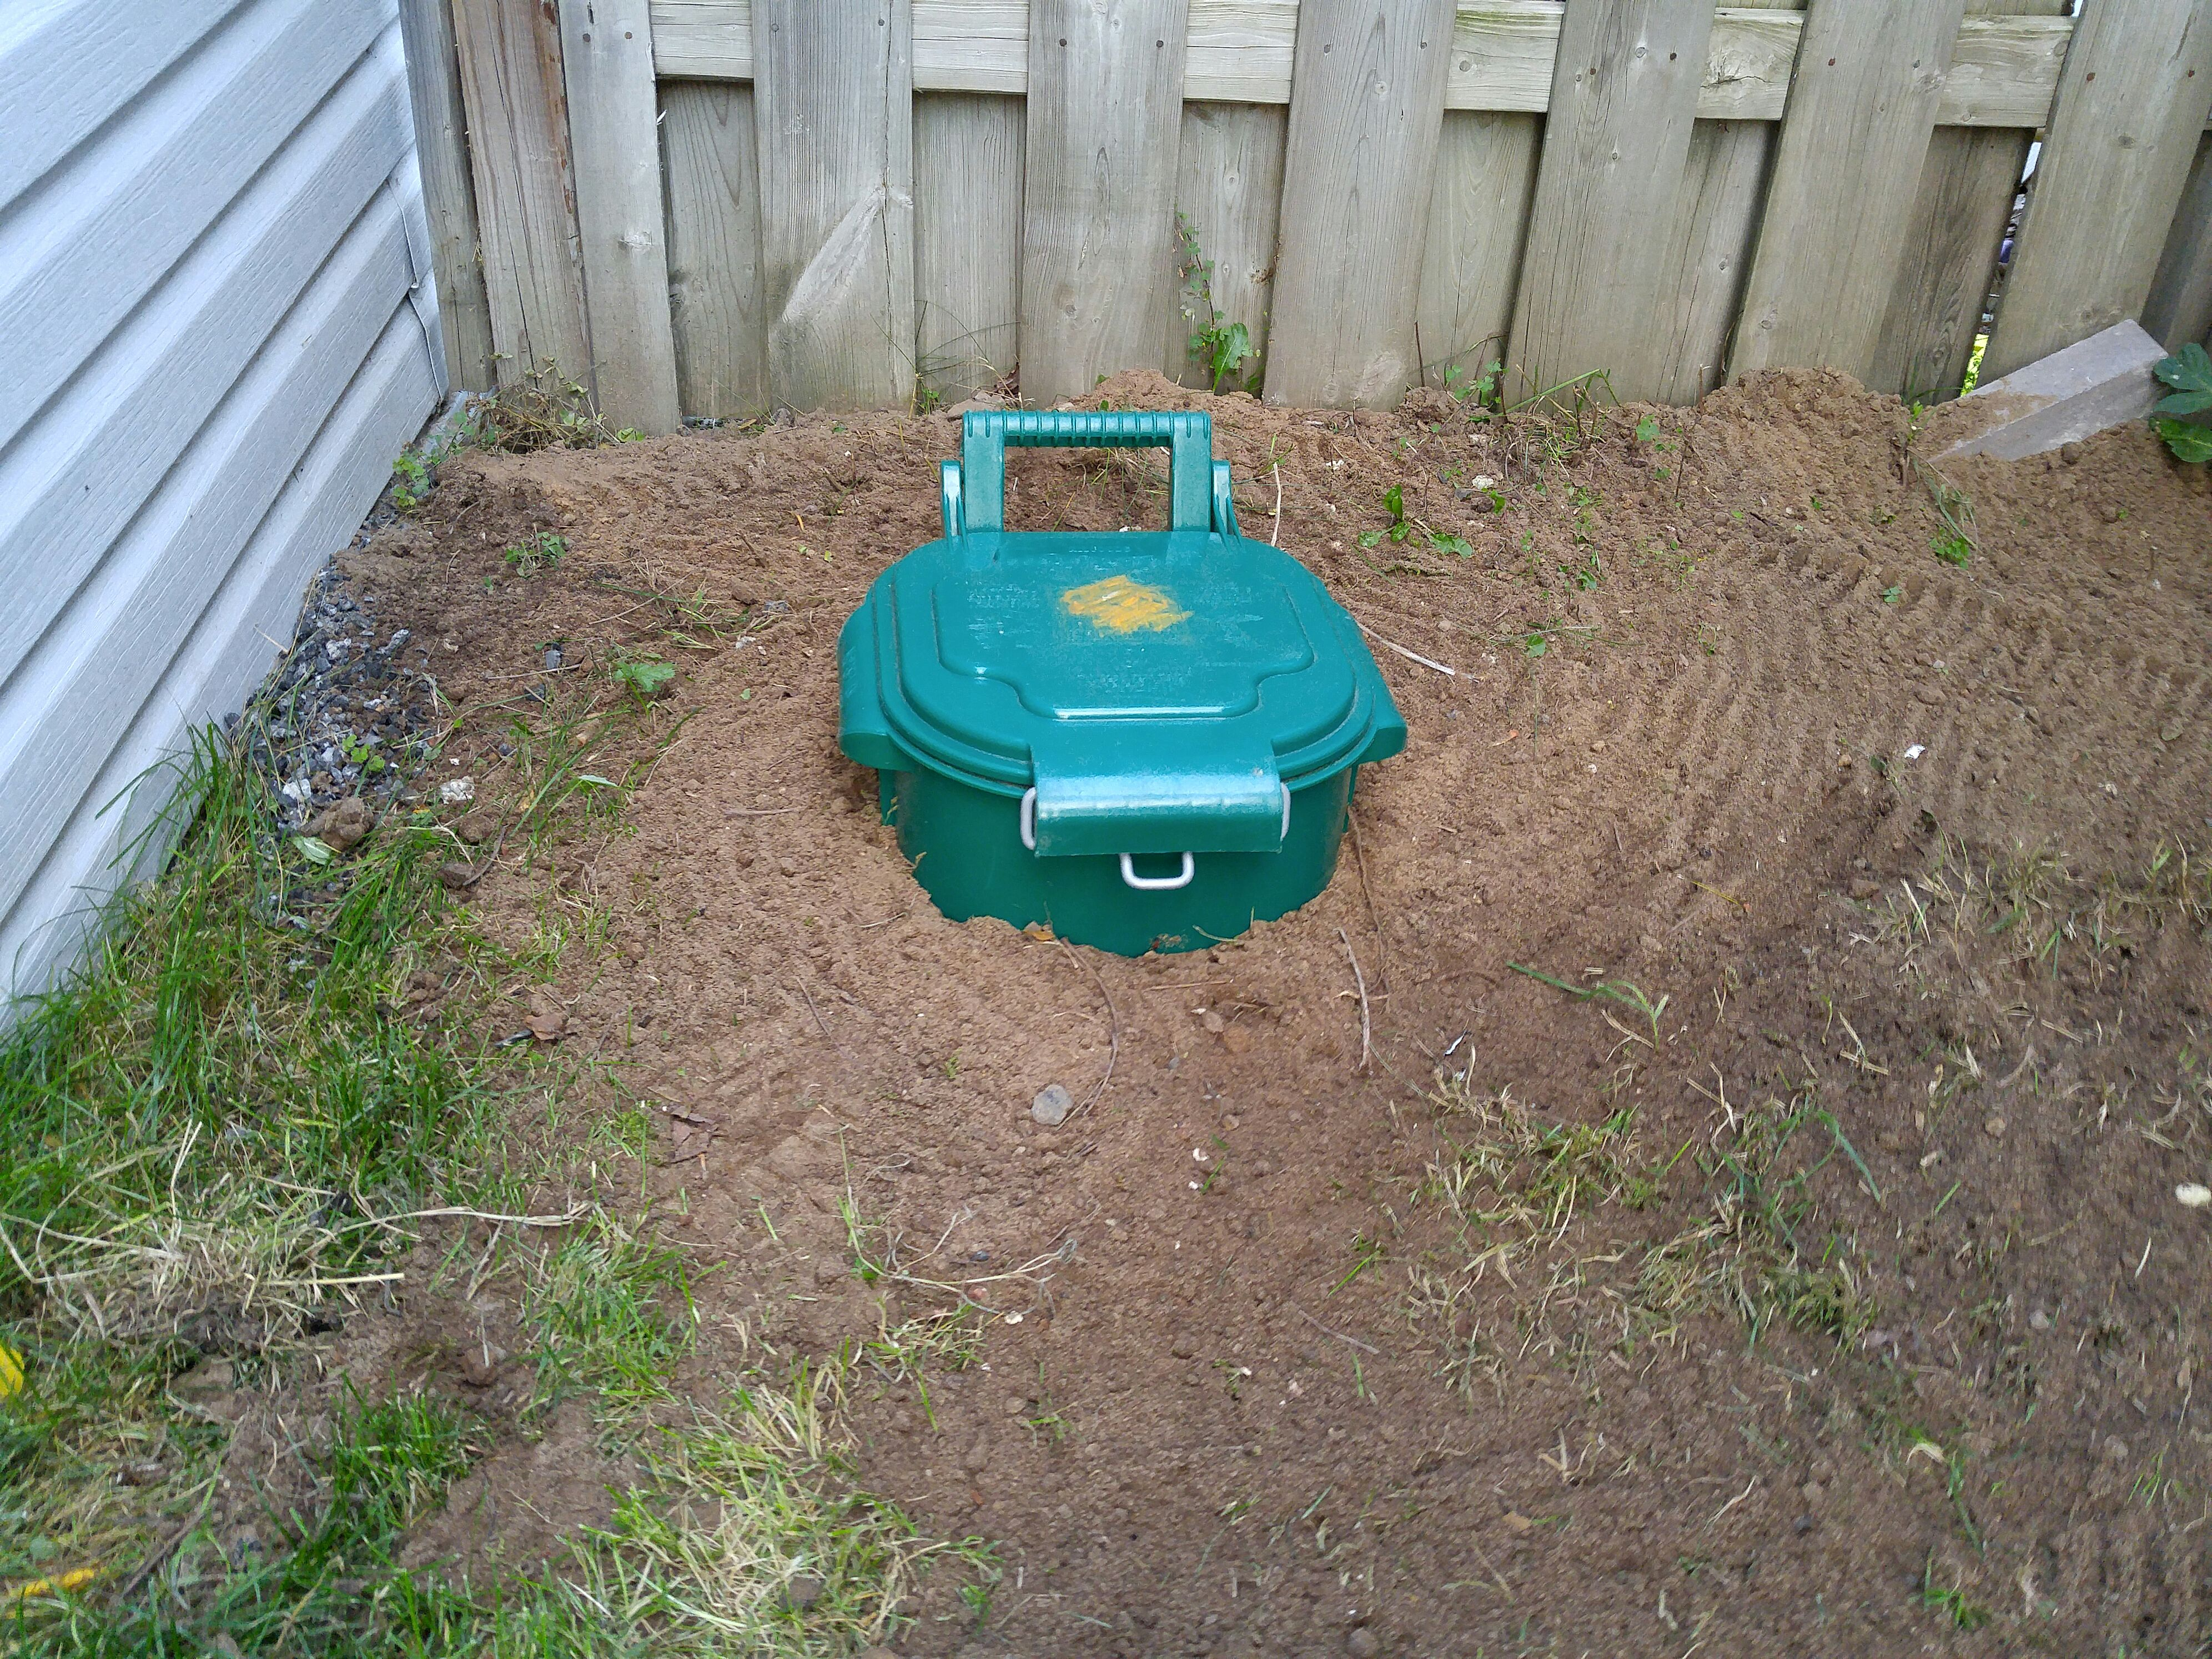 Back yard dog poo compost septic tank